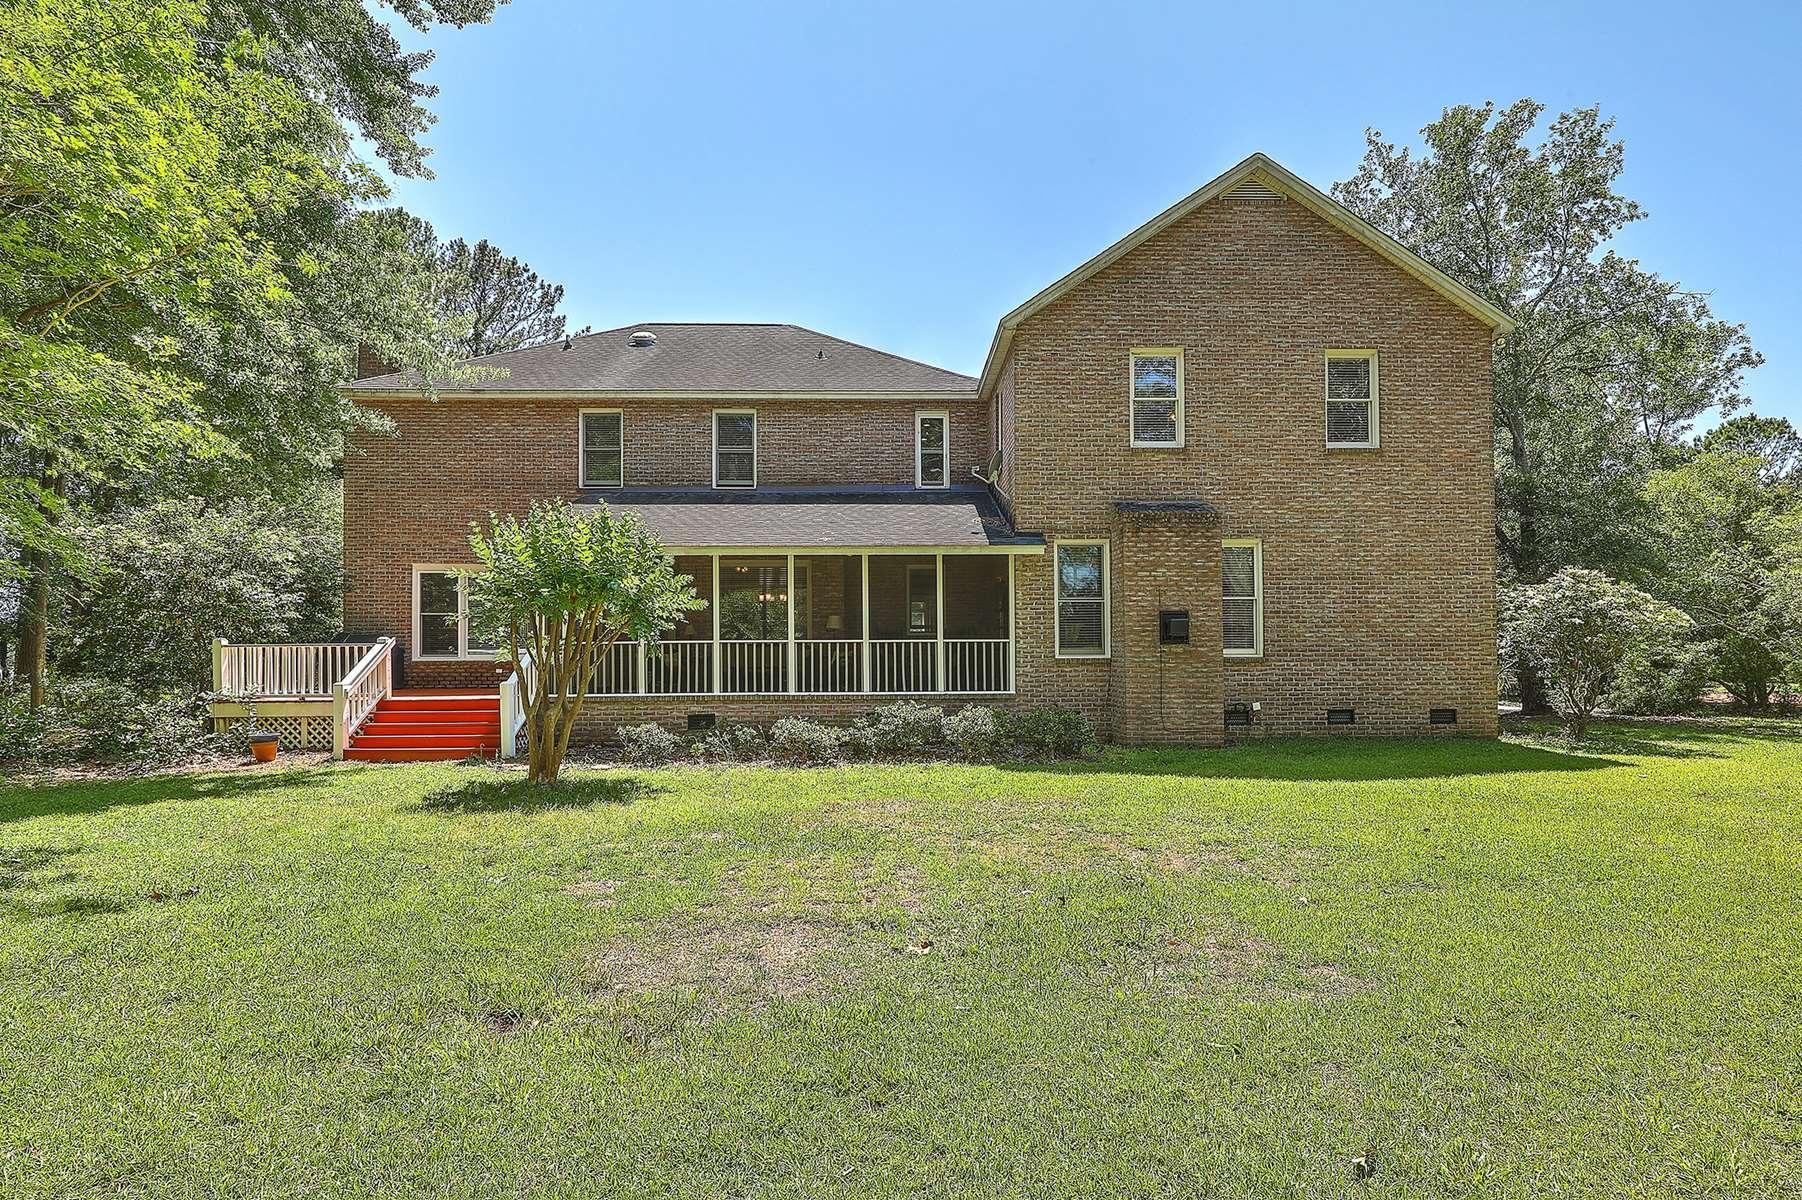 Dunes West Homes For Sale - 2961 Pignatelli, Mount Pleasant, SC - 28